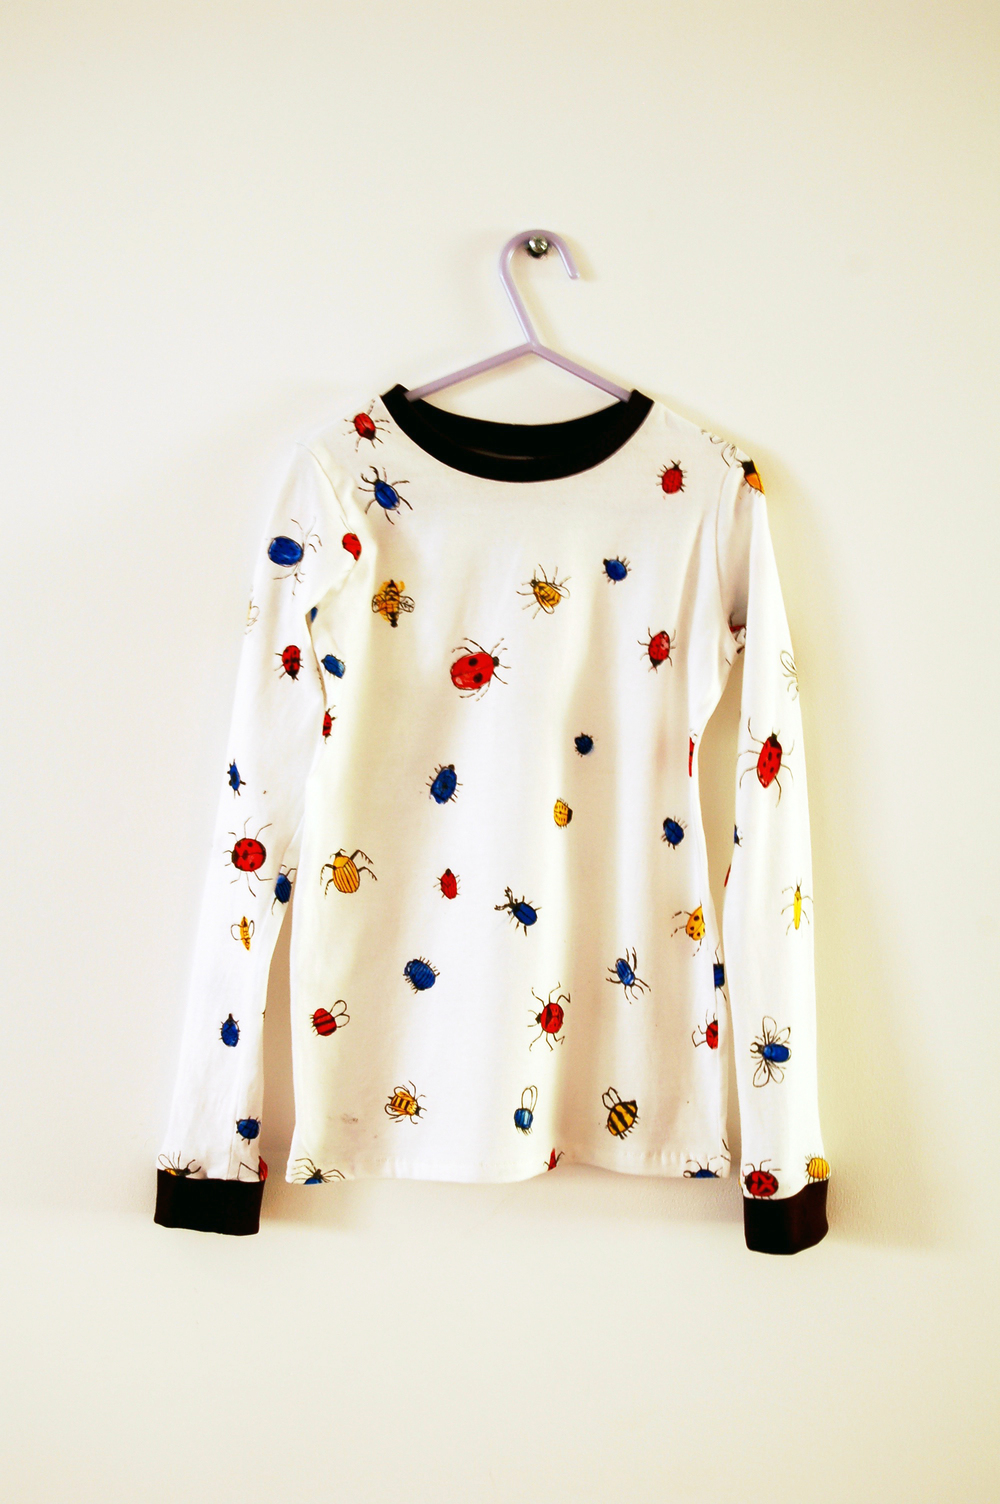 insect print pyjama top